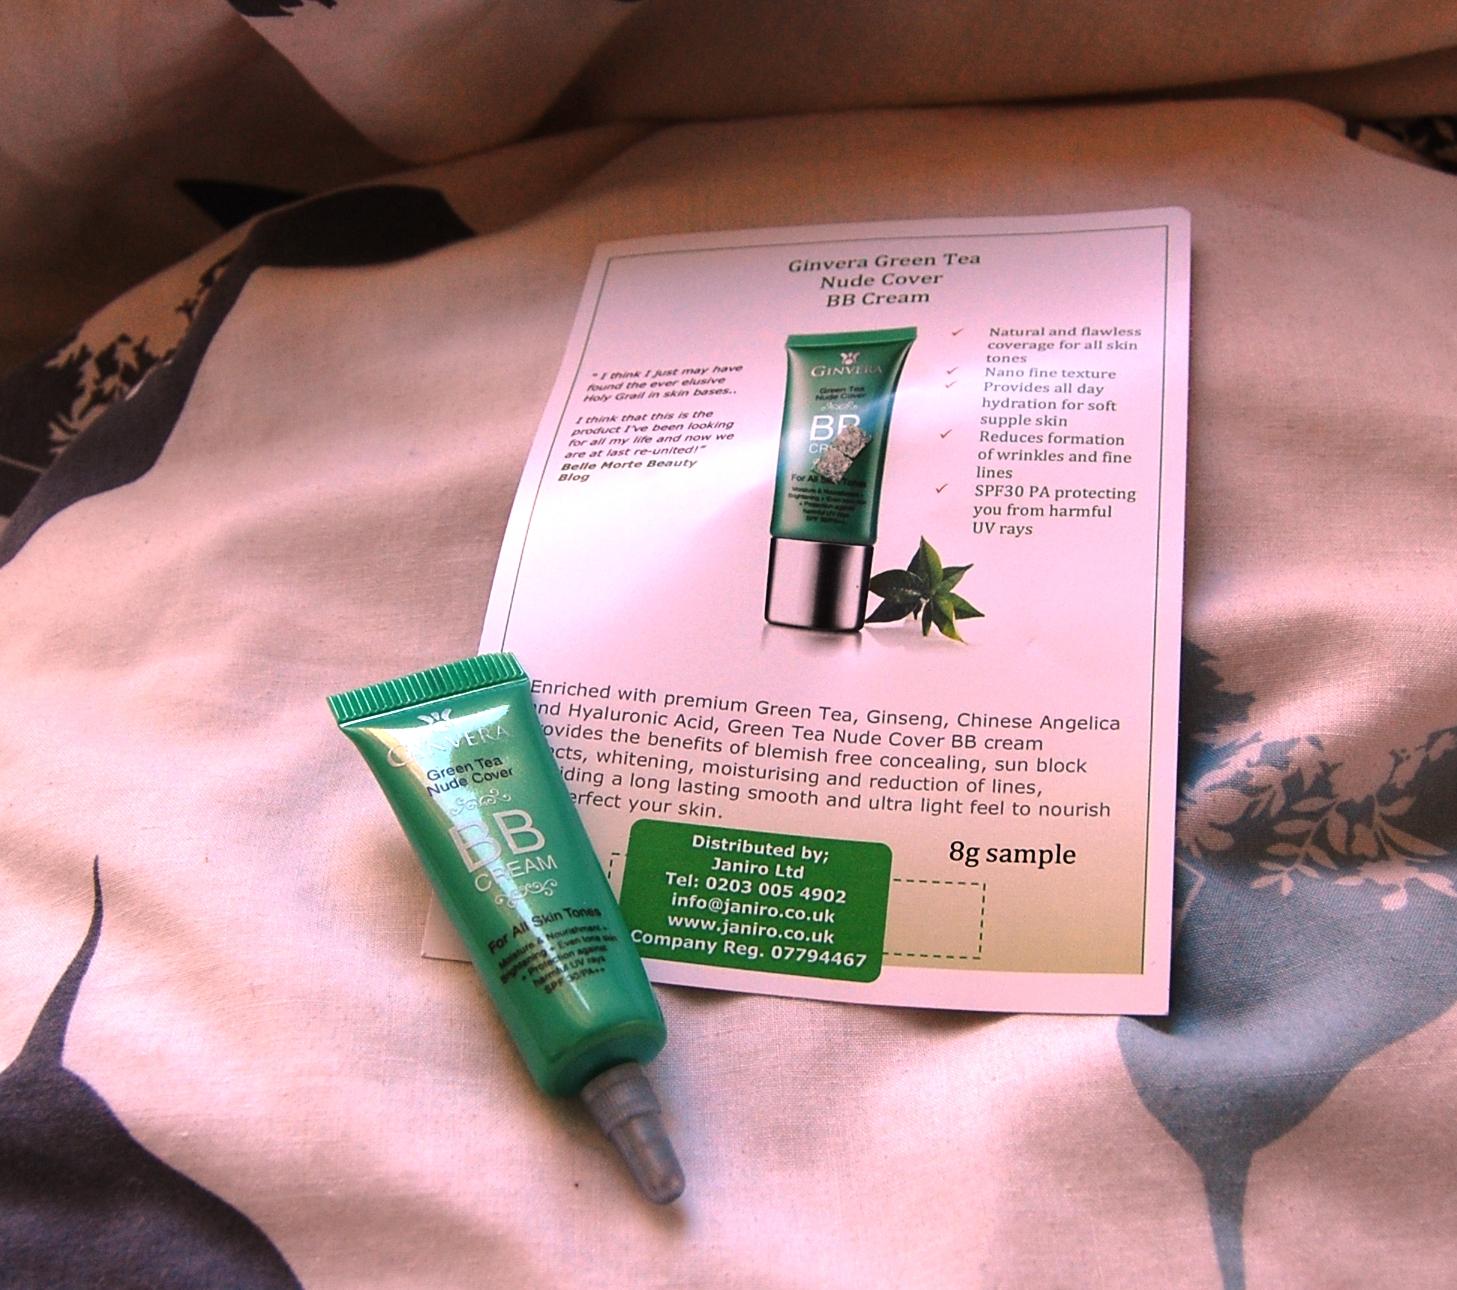 Sleepy Lah : Ginvera Green Tea Aqua Whitening Cream and